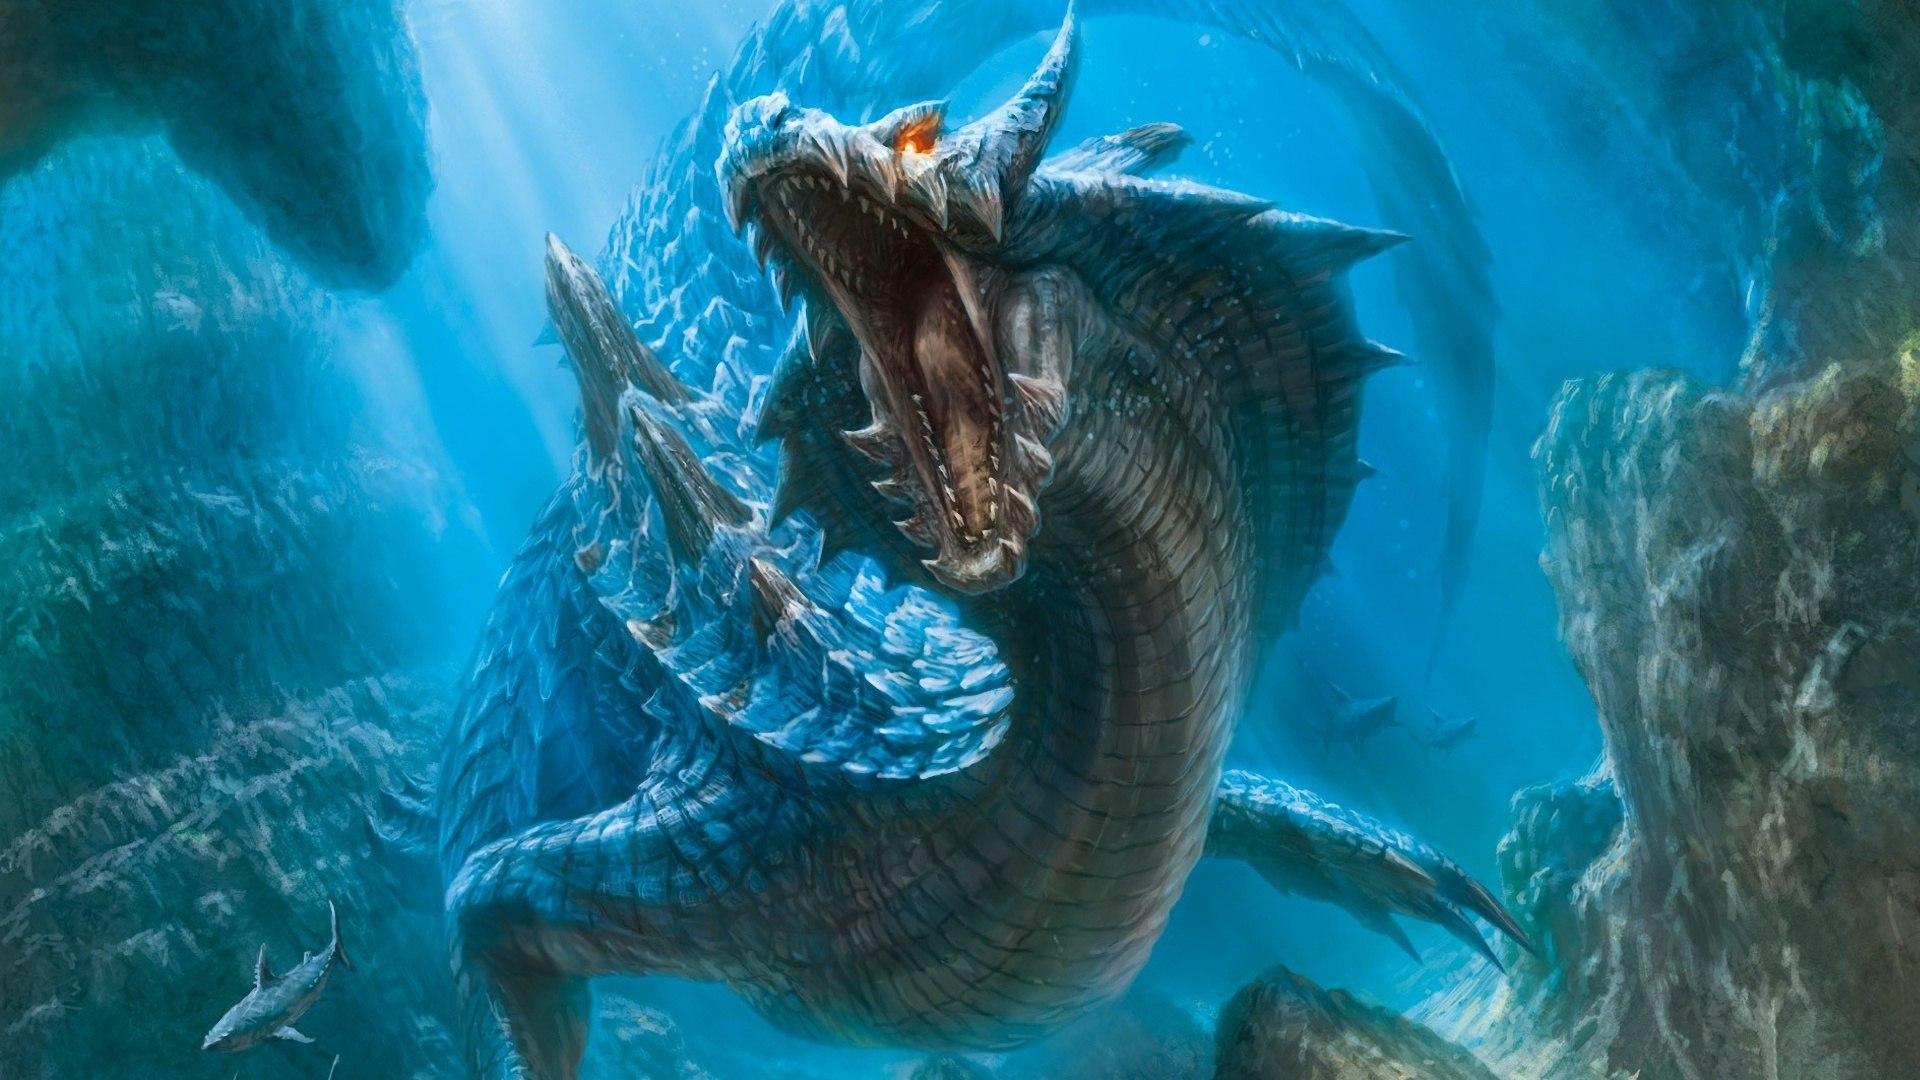 Dragon wallpaper 1920x1080 HQ WALLPAPER   34224 1920x1080